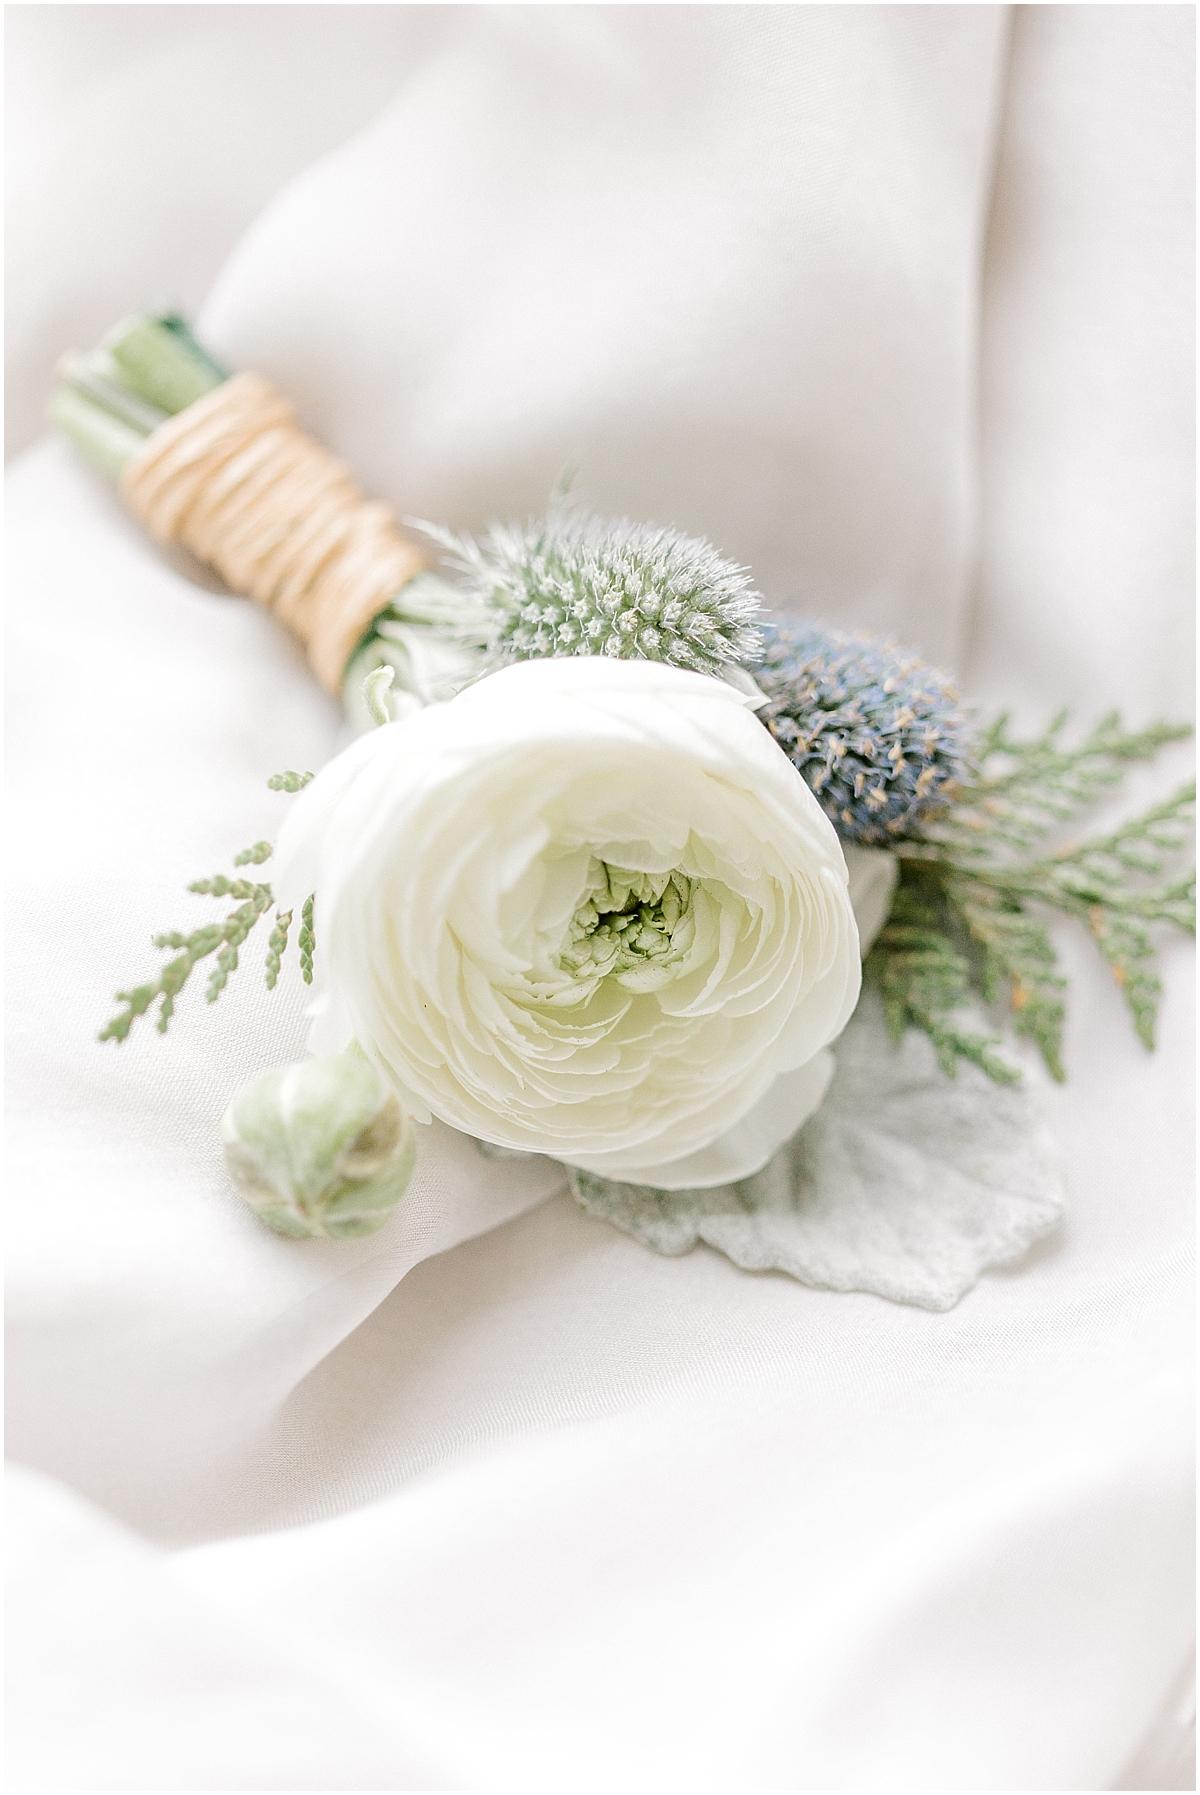 Chehalis Washington Winter Wedding Silver and White | Willapa Hills Farm Wedding | Eastham | Emma Rose Company PNW Light and Airy Wedding Photographer_0008.jpg